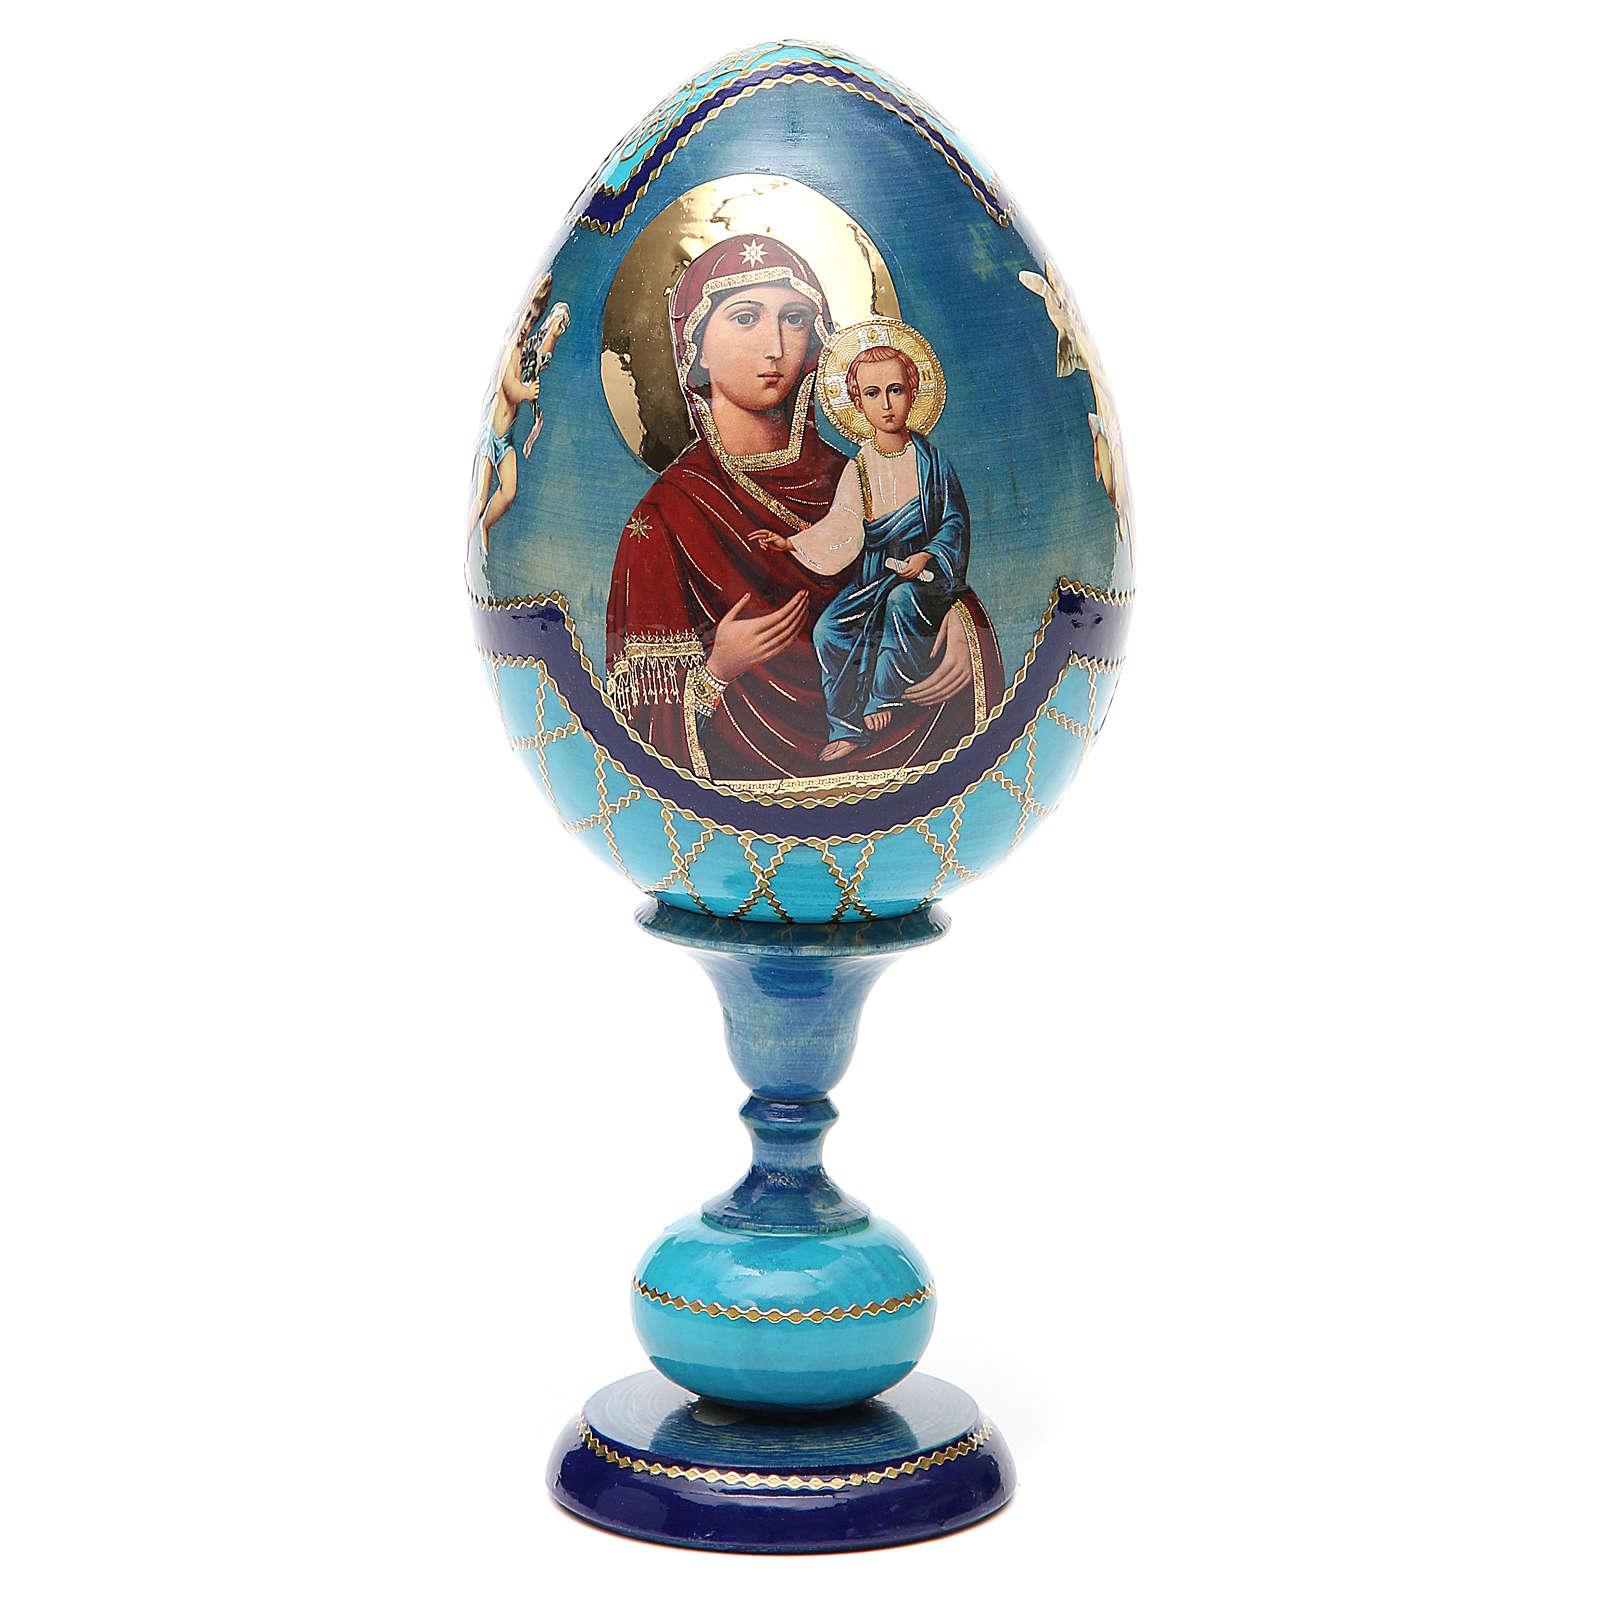 Oeuf Russie découpage Smolenskaya h 20 cm style Fabergé 4